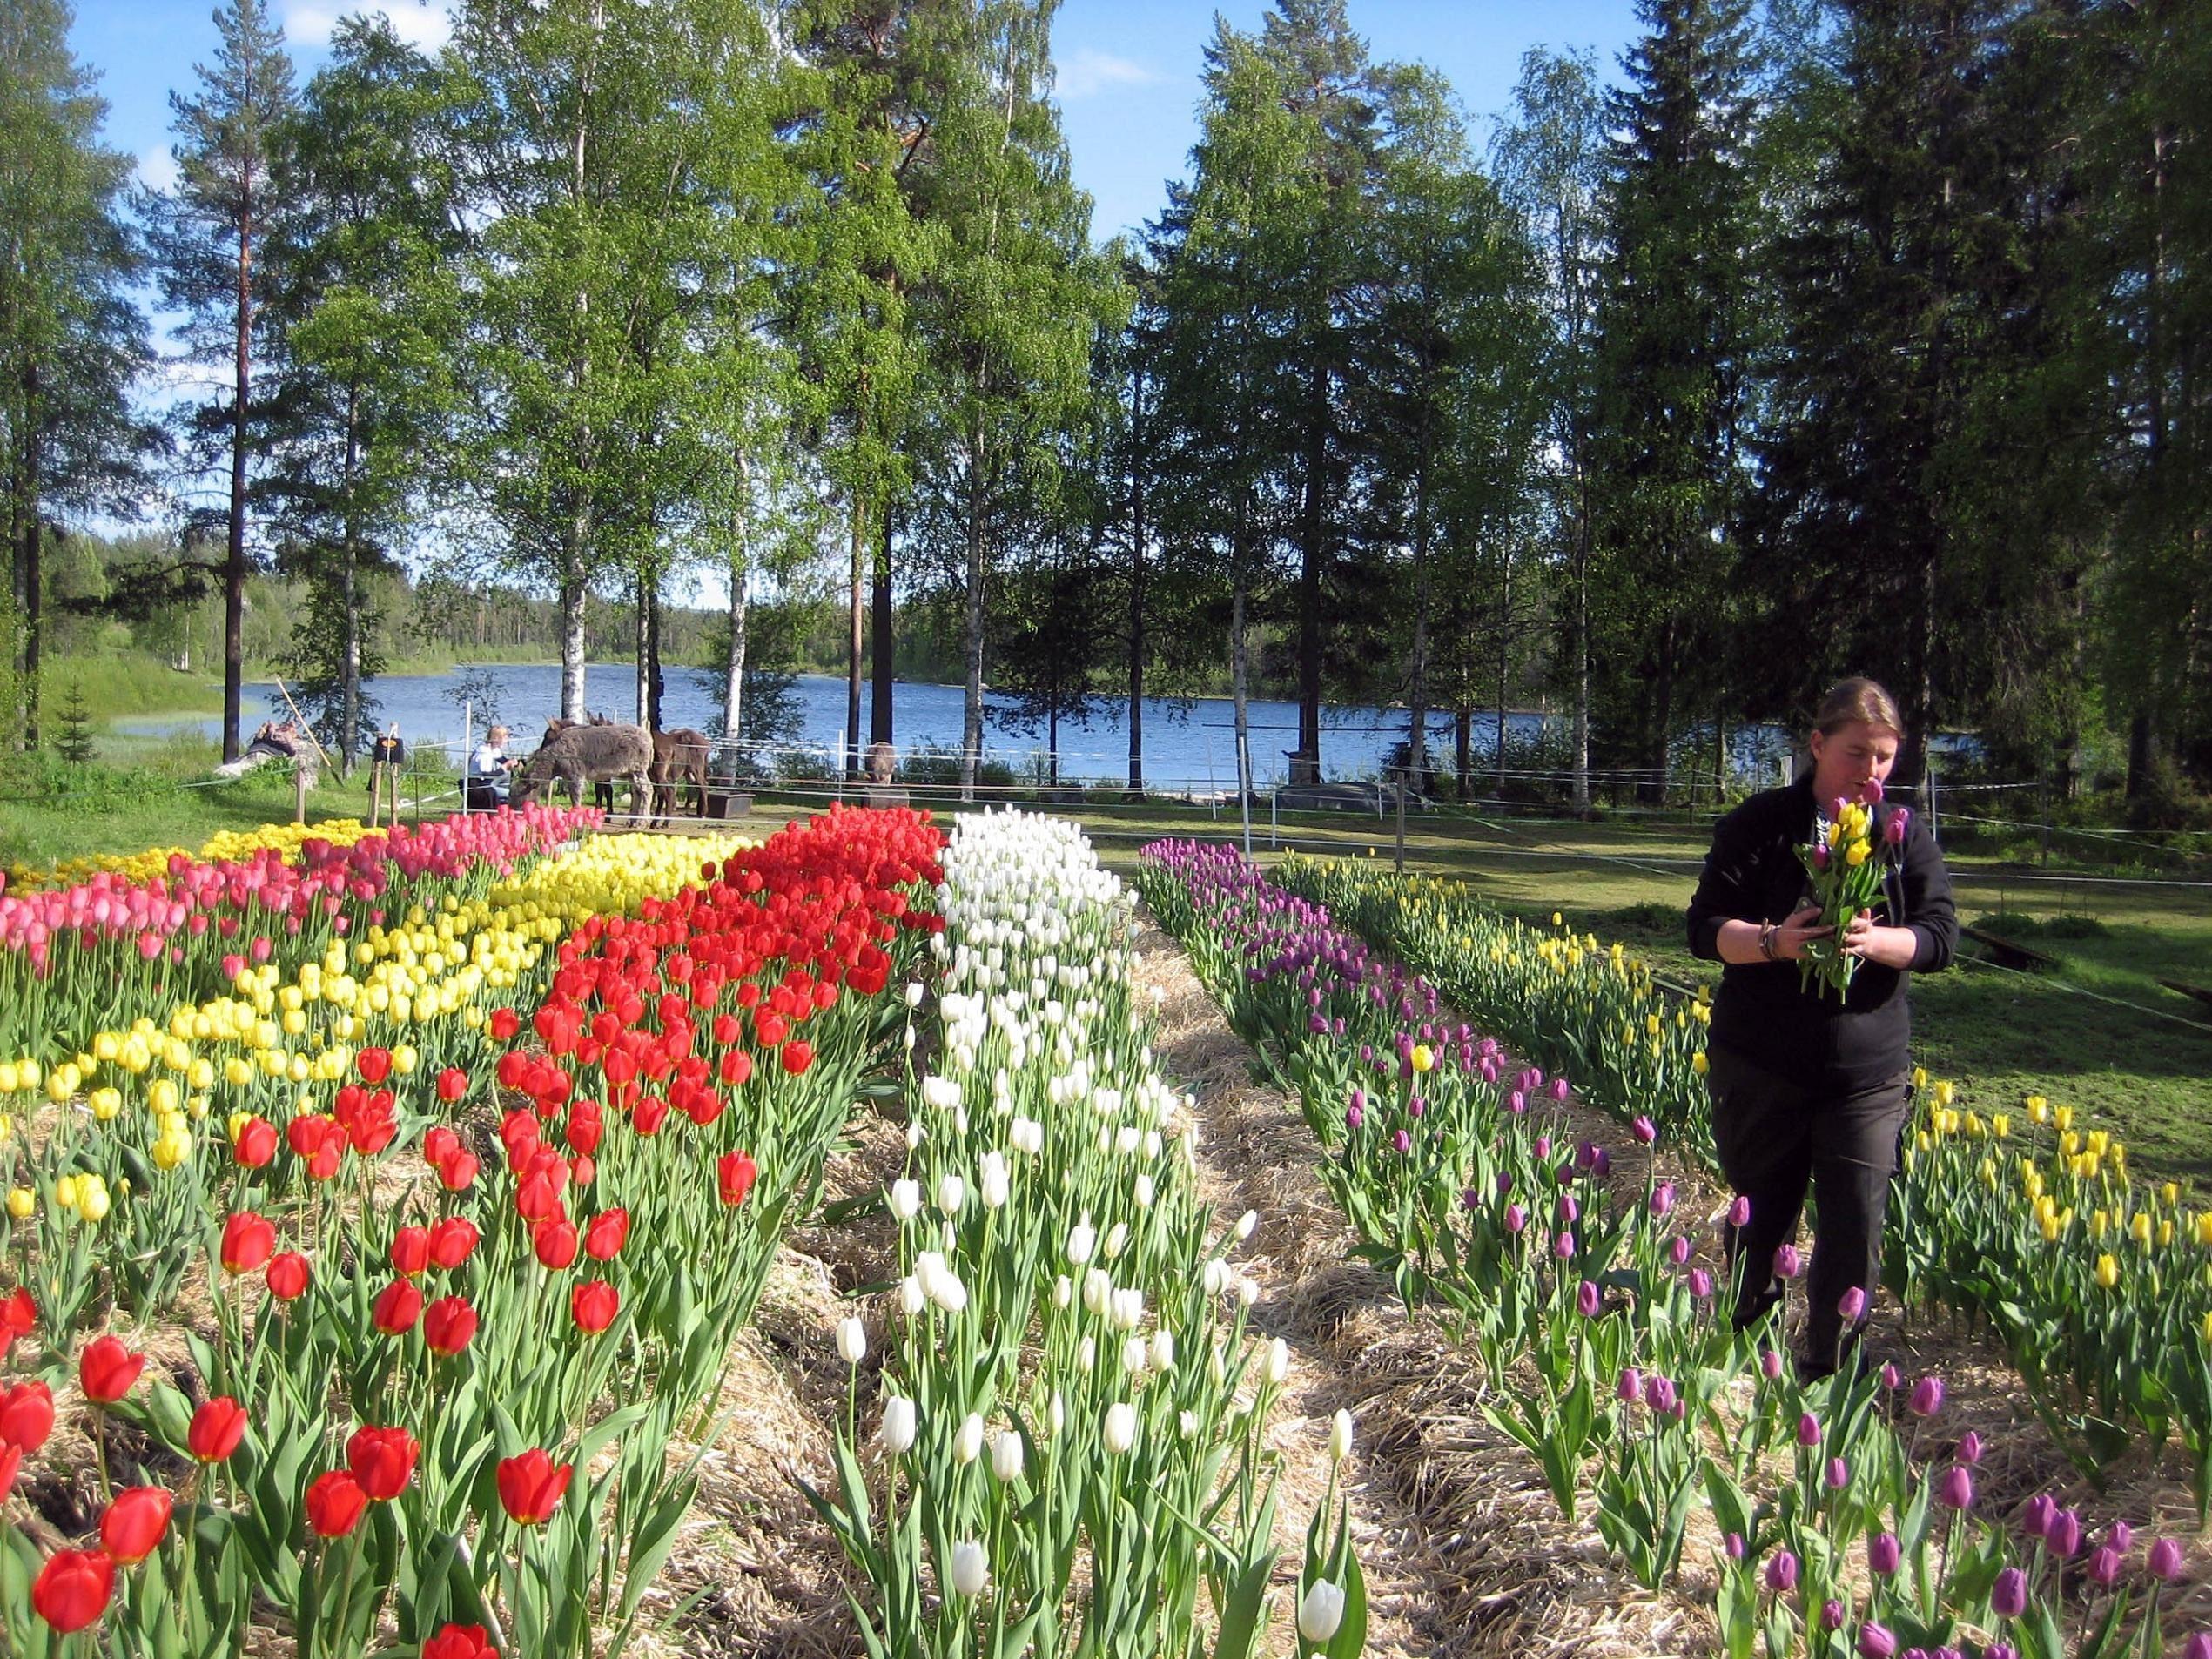 Activities at Farm Backsjön in Ådalen